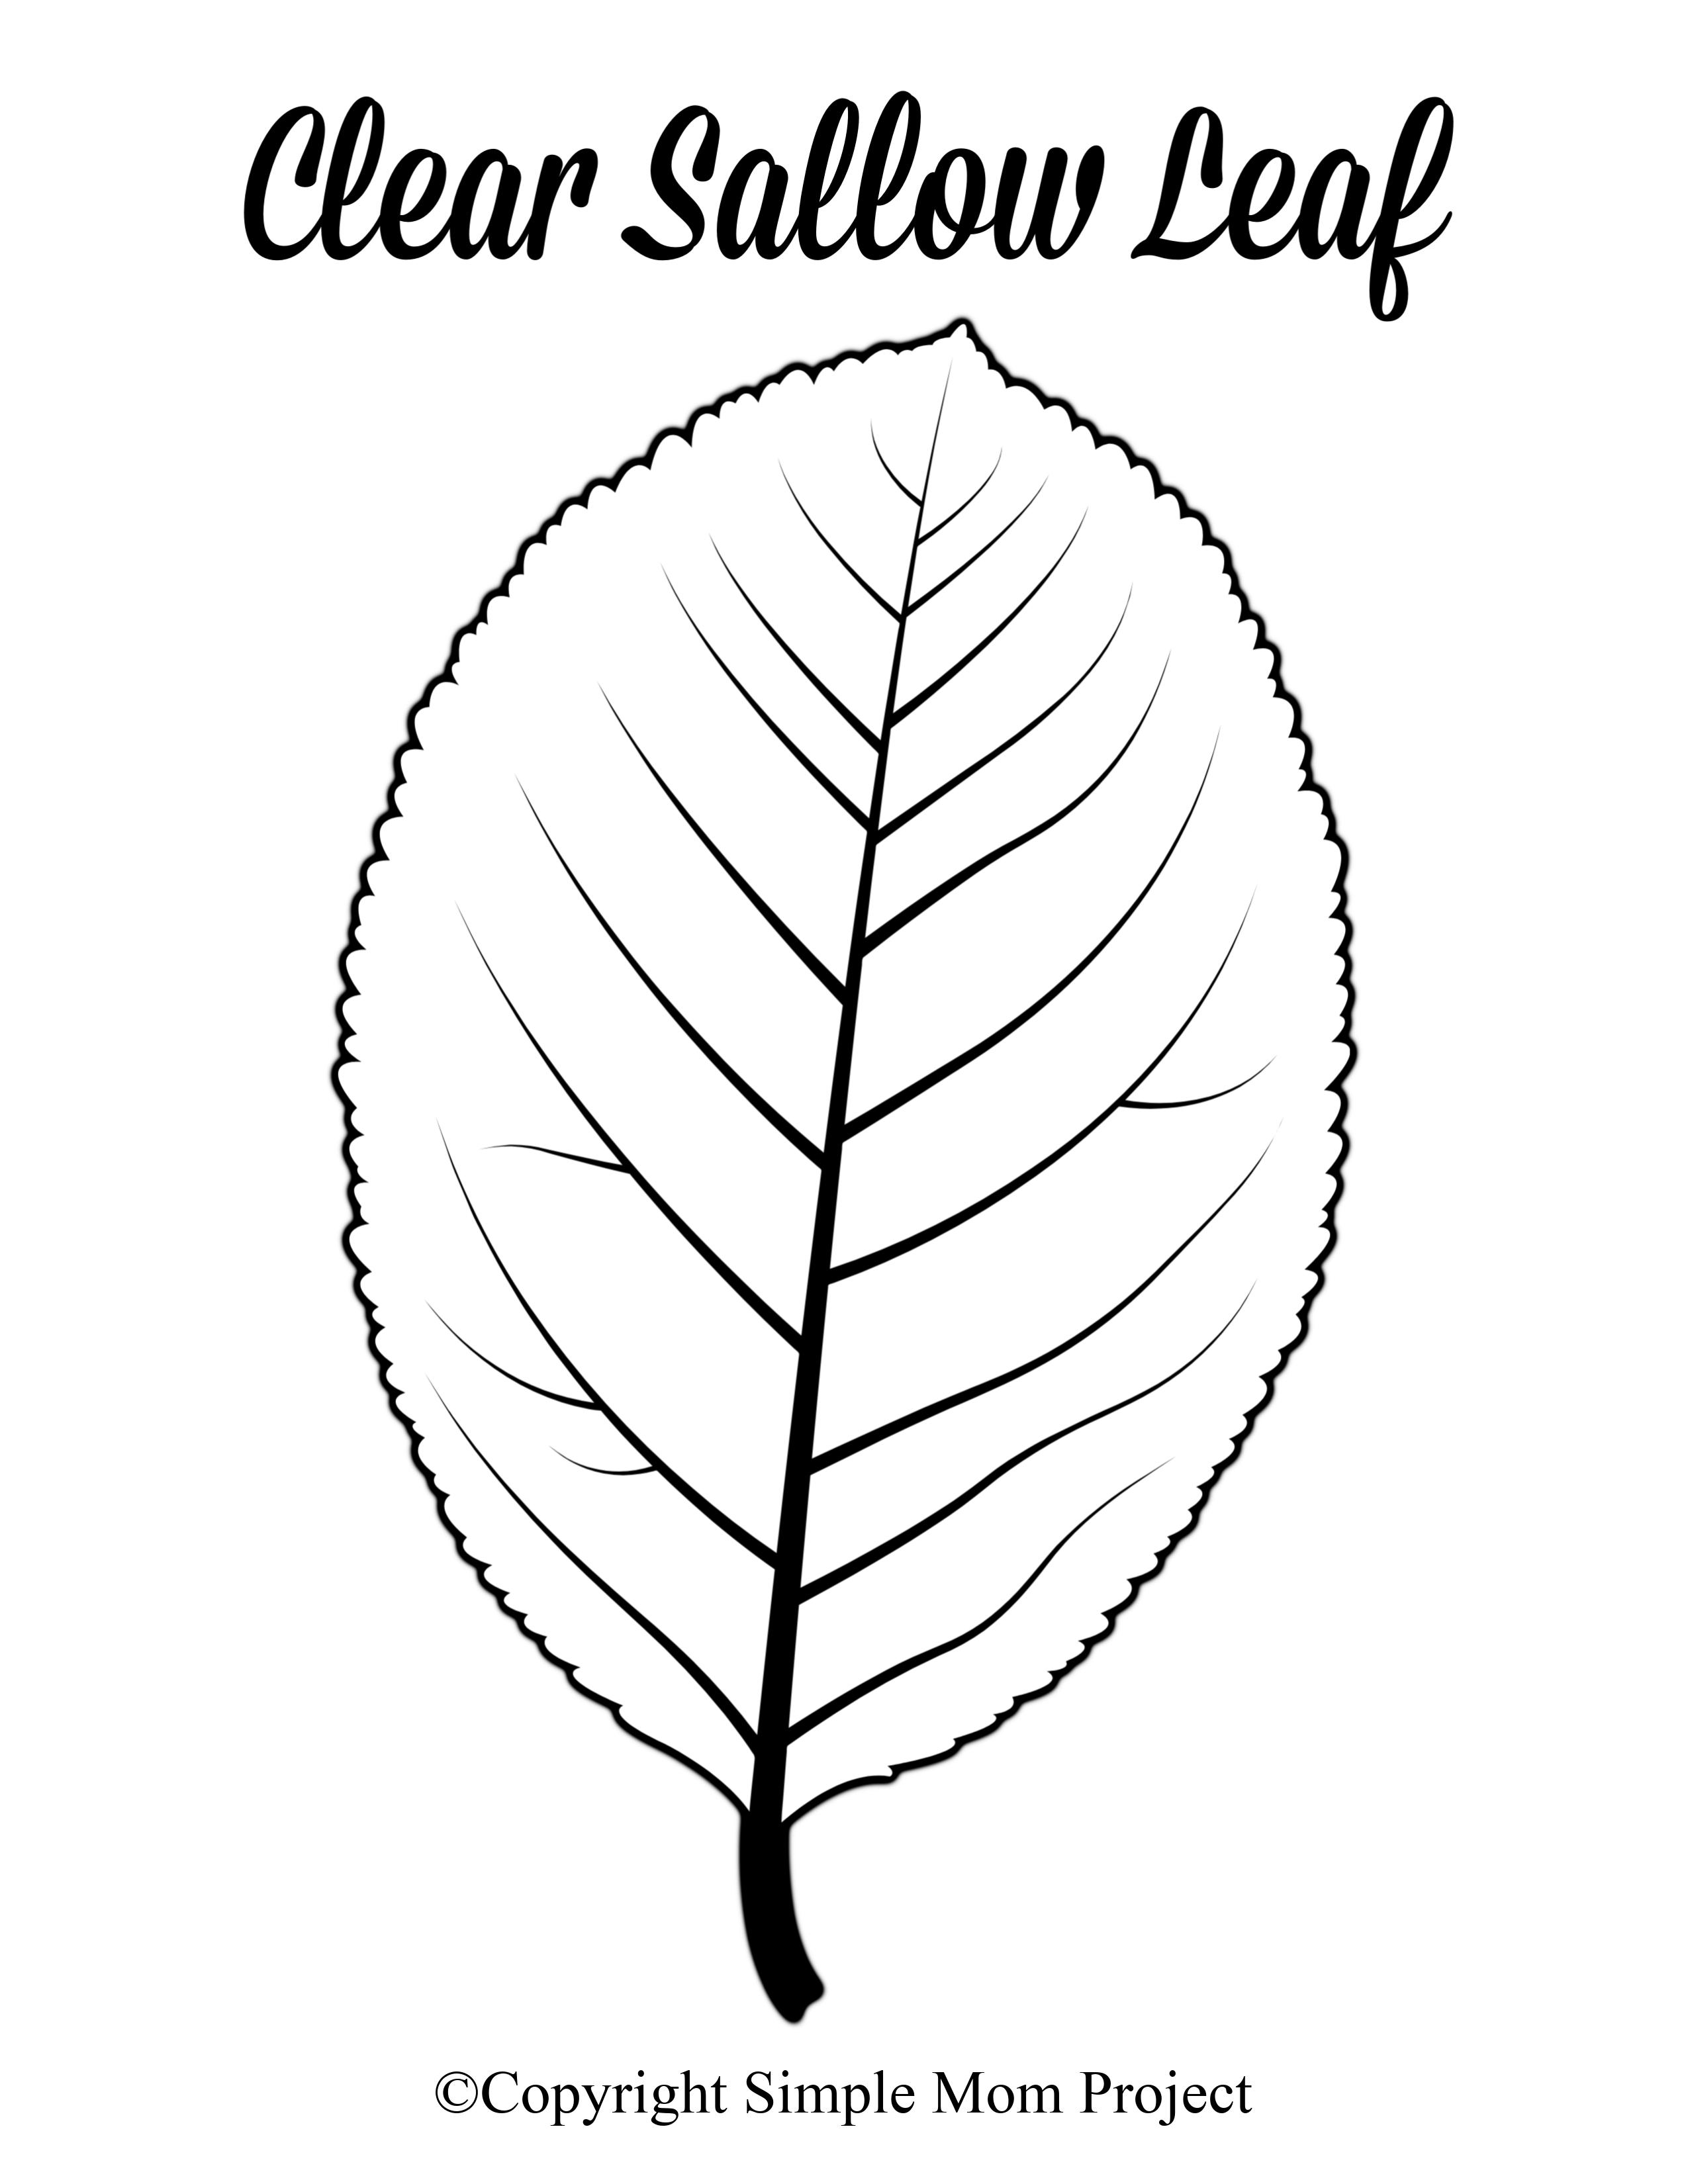 Free Printable Large Leaf Templates Stencils And Patterns Leaf Template Leaf Template Printable Fall Leaf Template